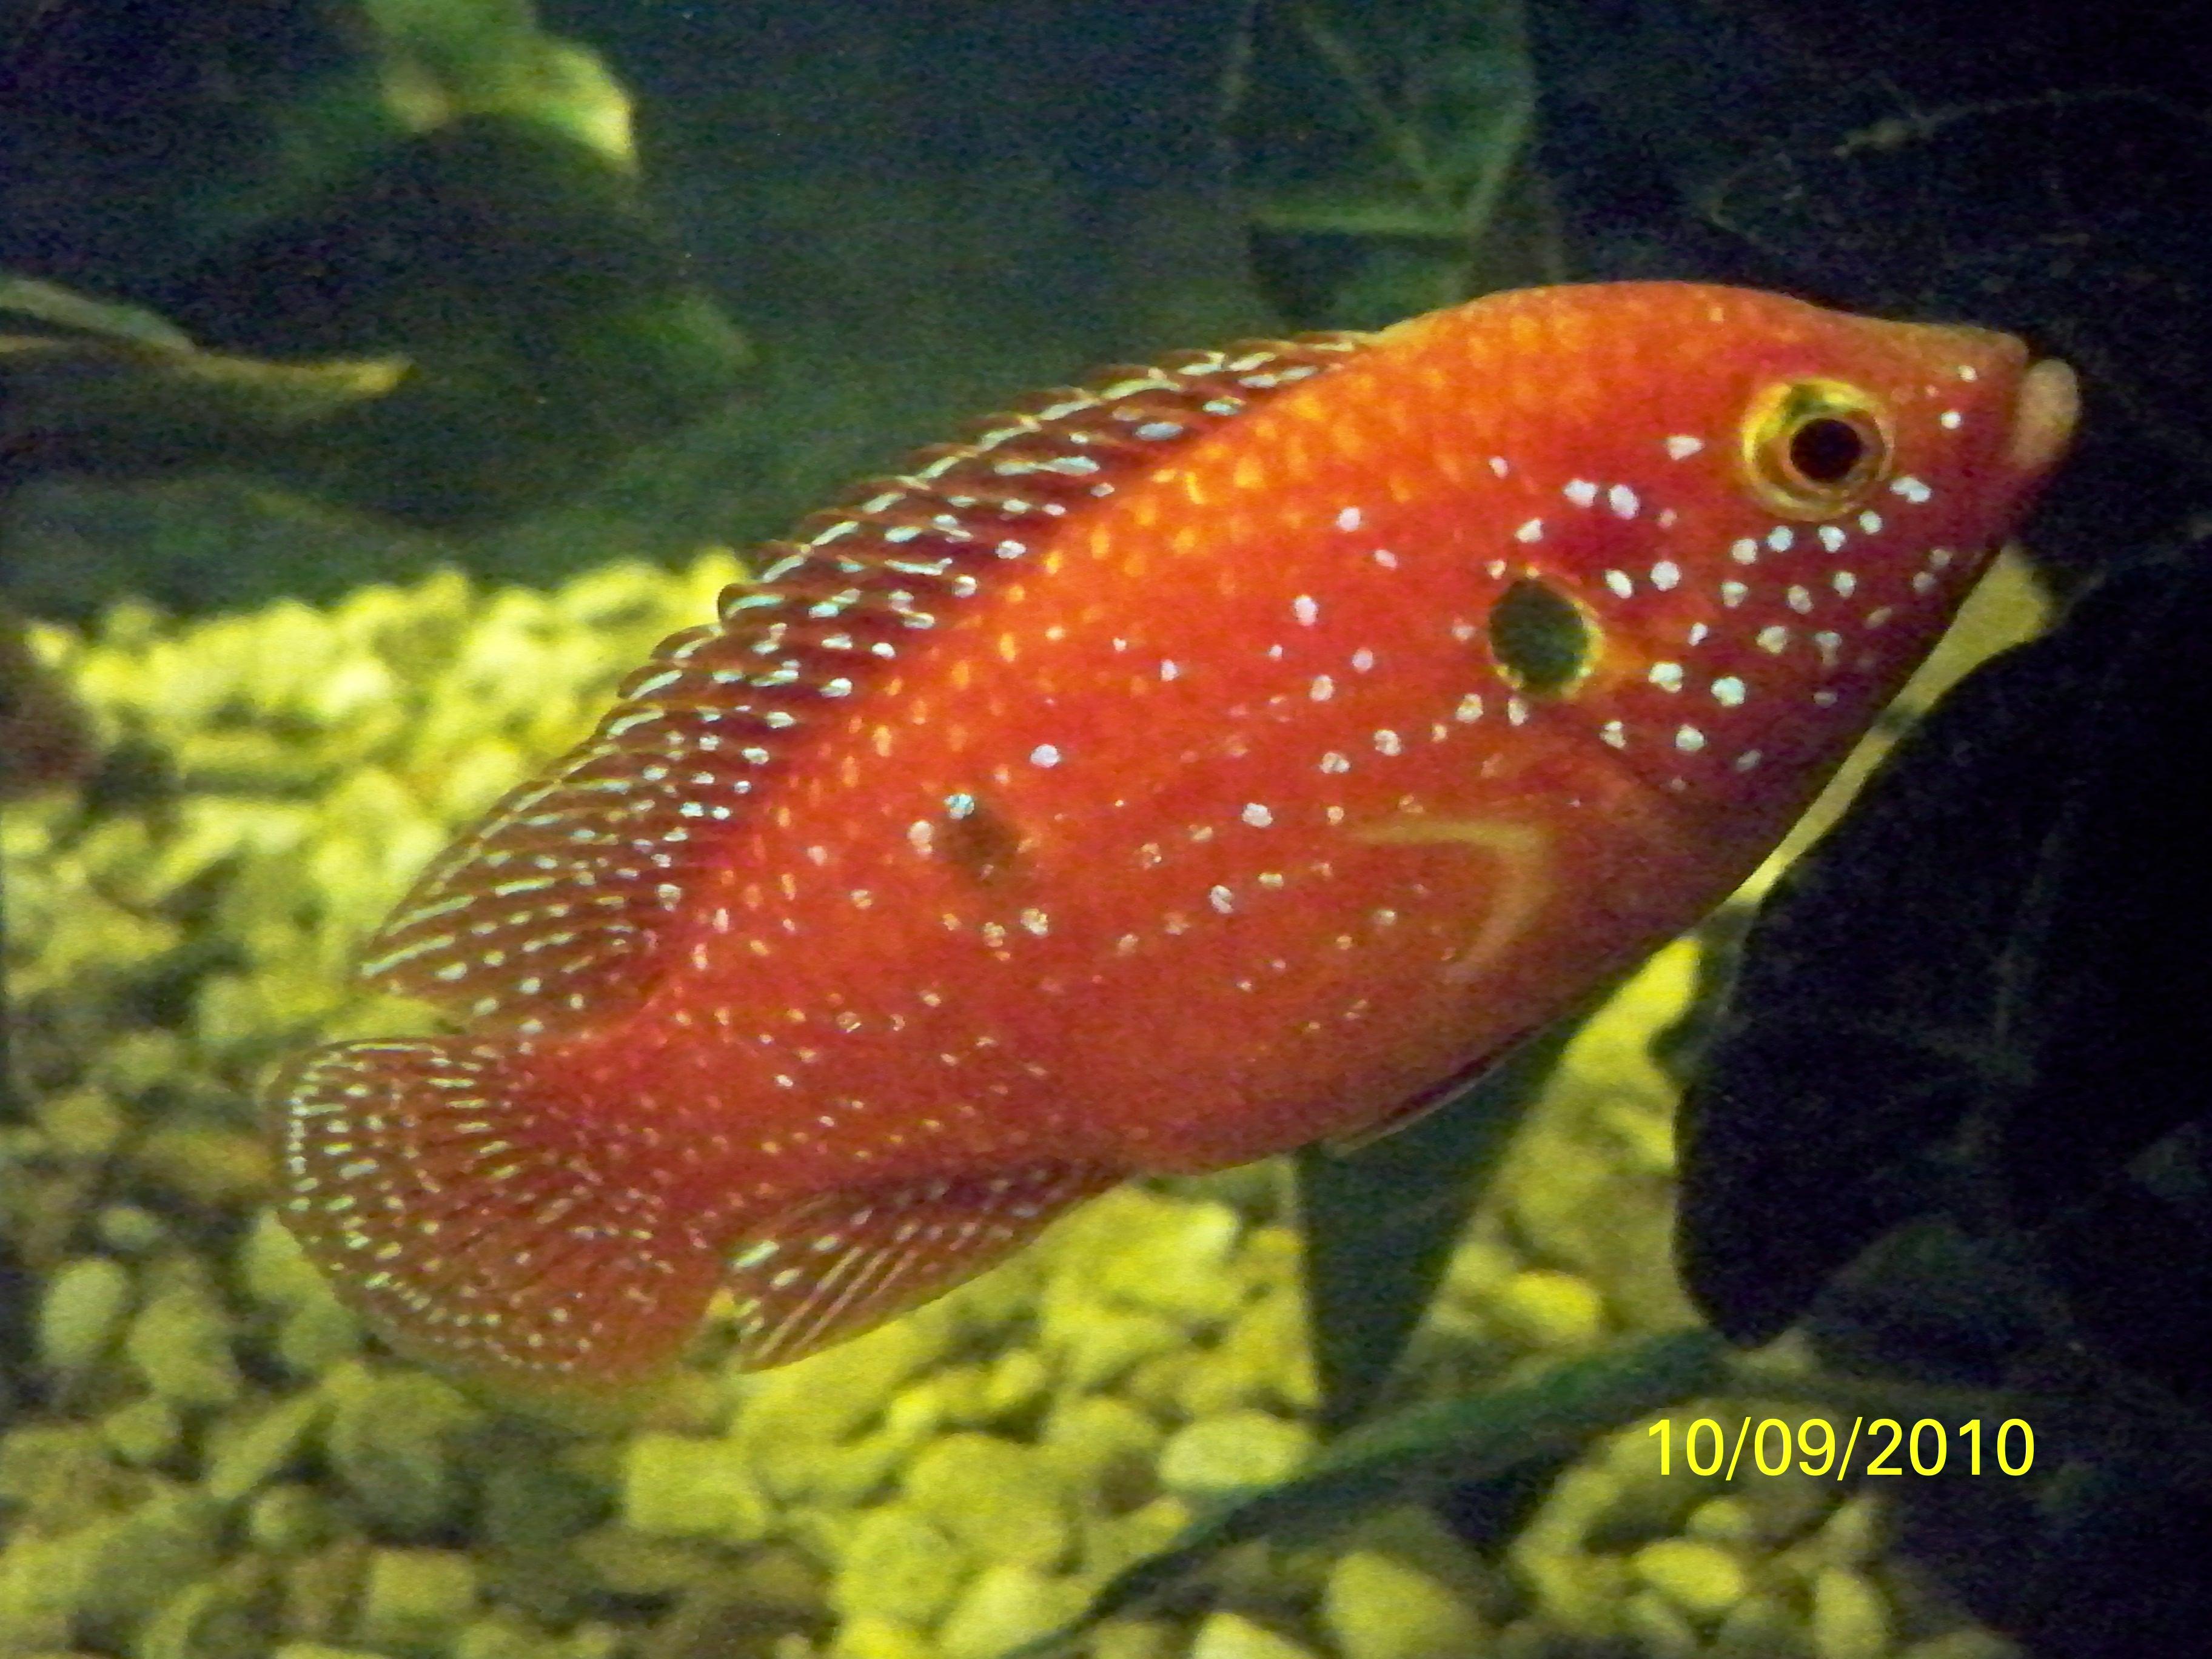 cichlids.com: Here is My Red Jewel (Hemichromis lifalili )